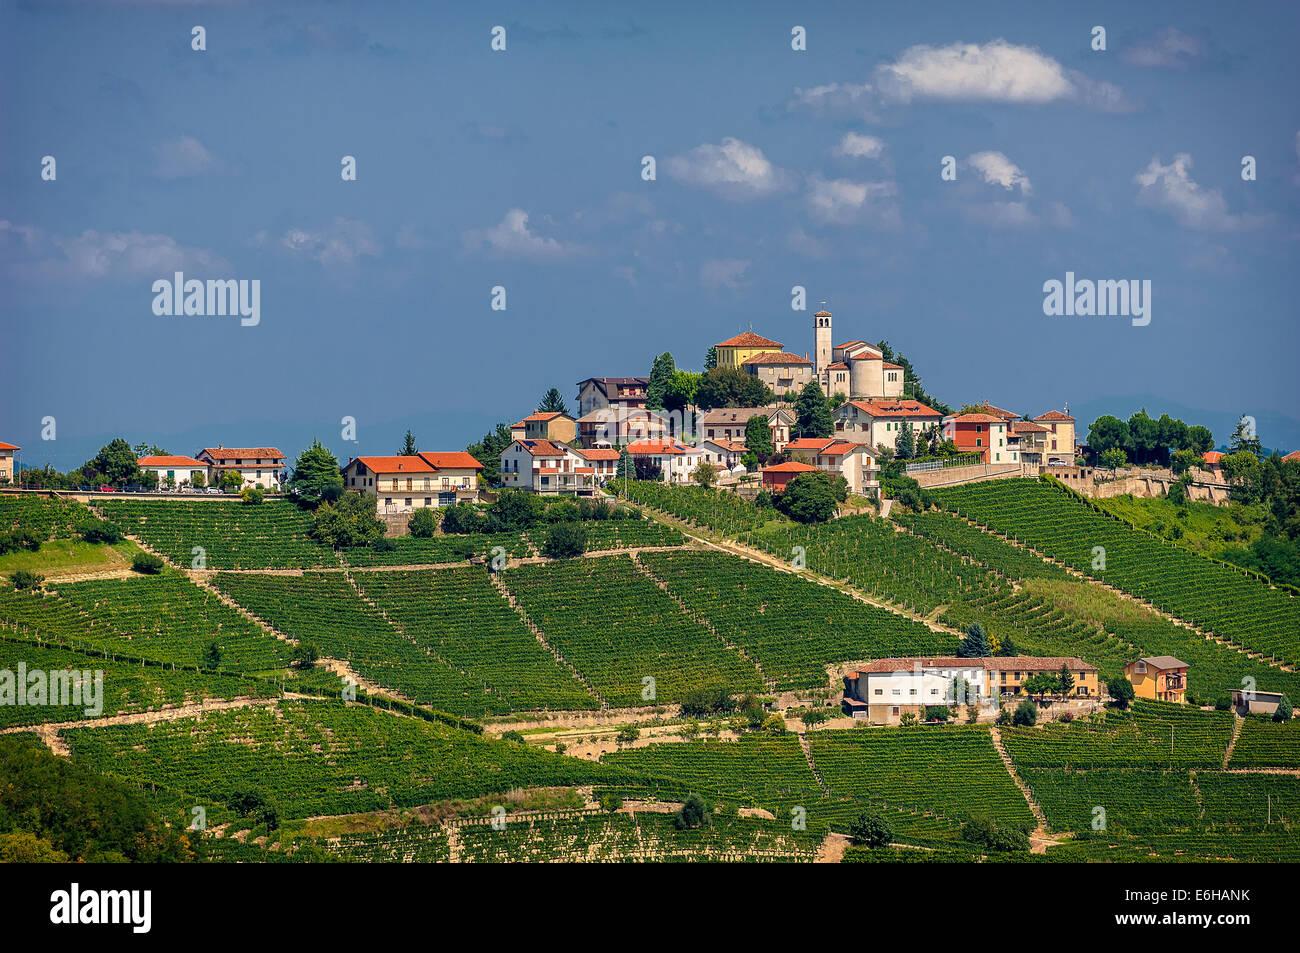 Italy Piedmont Langhe Camo - Stock Image